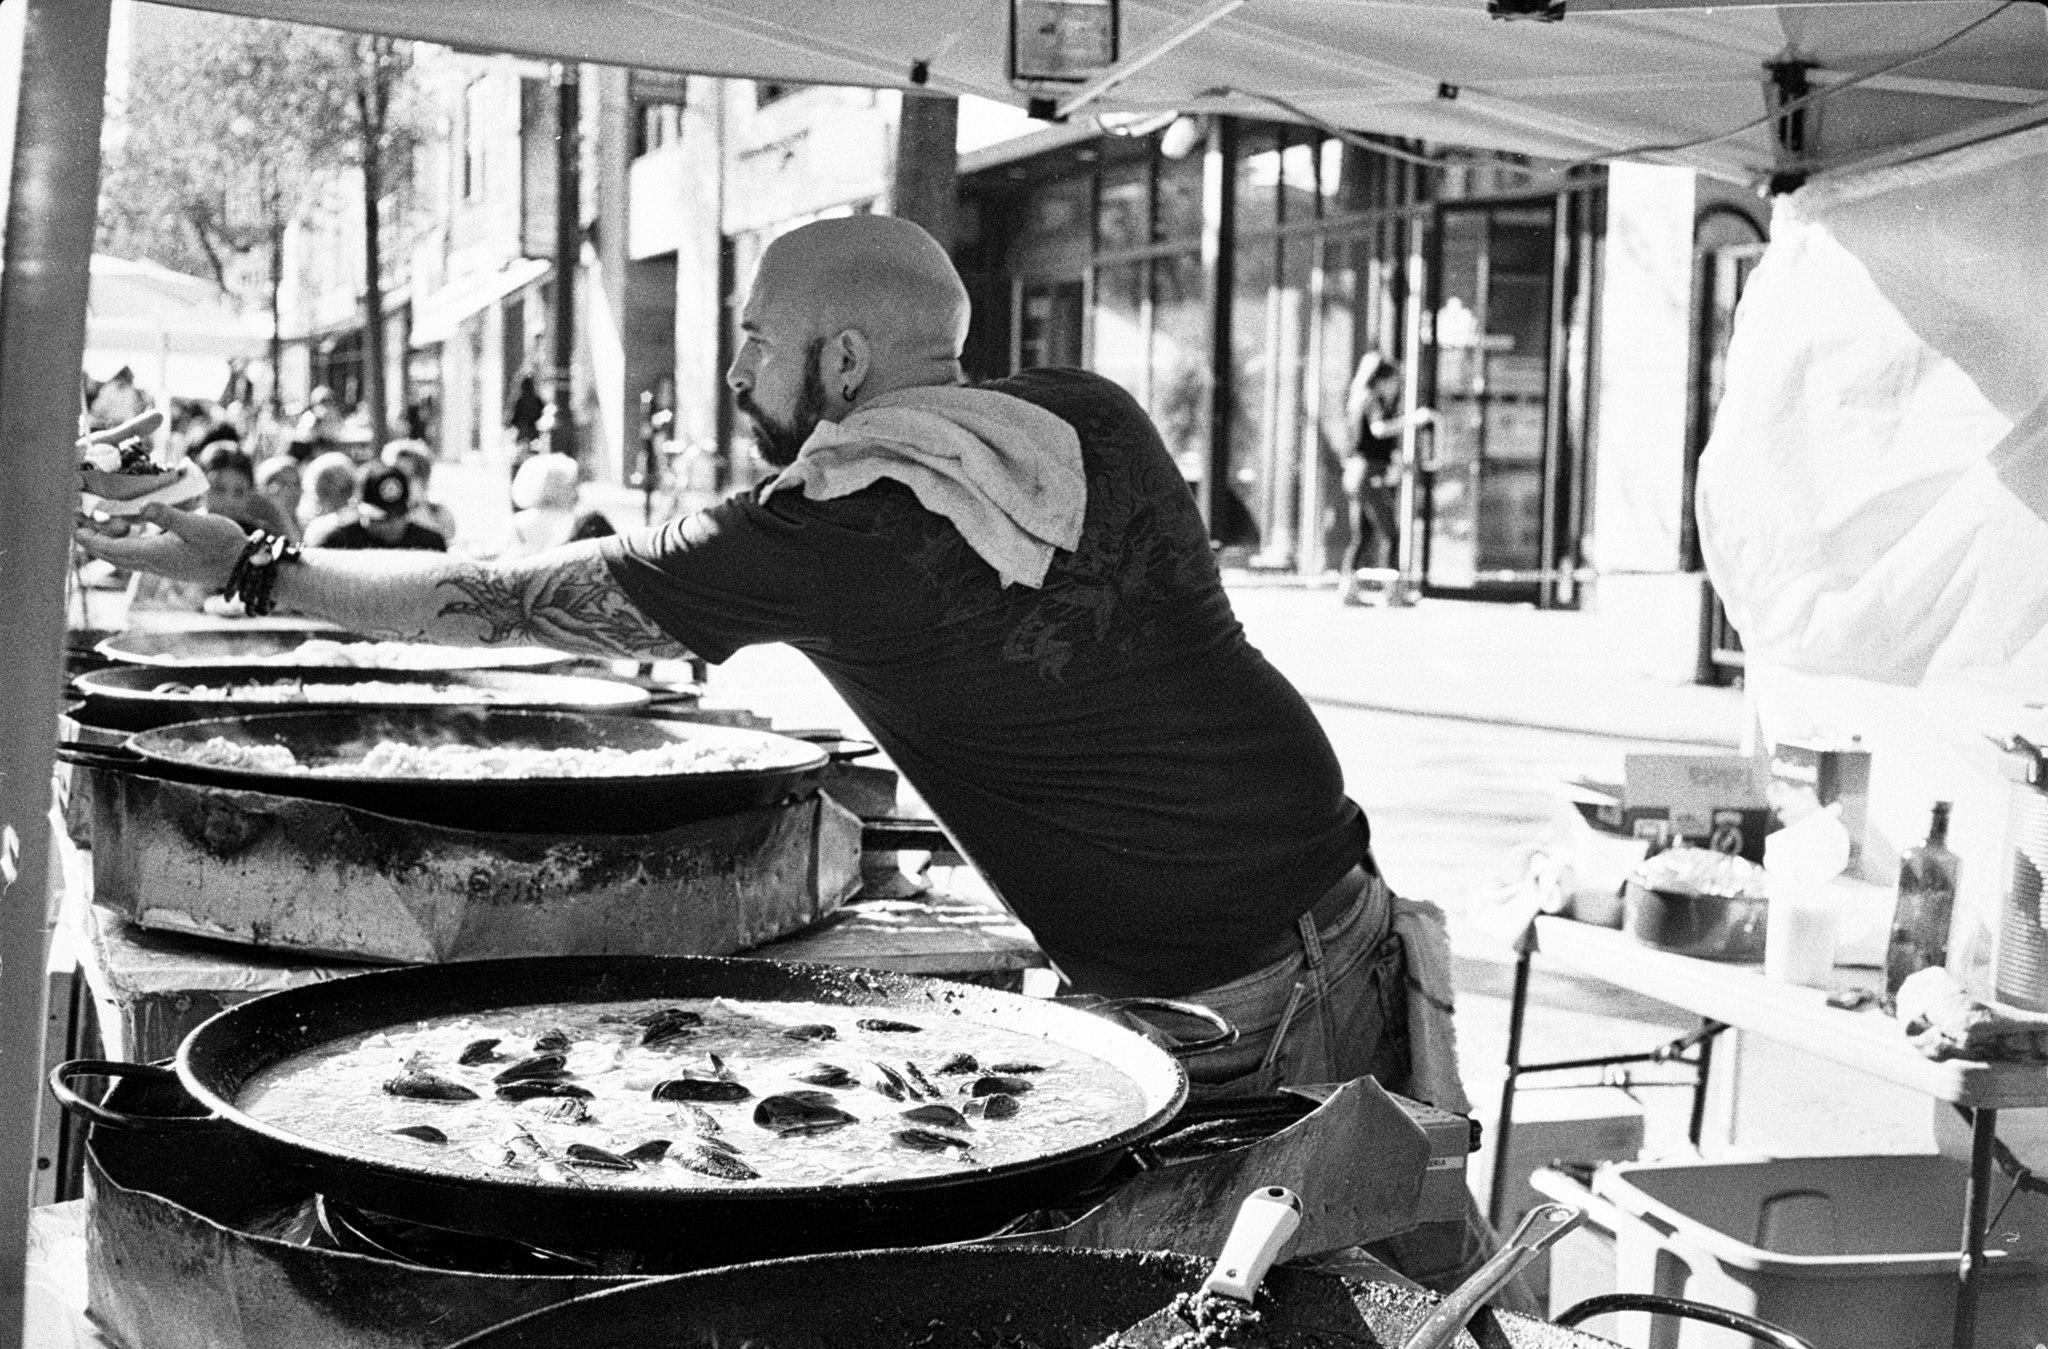 Street Paella 2017. Photo credit: Dragos Stoica.